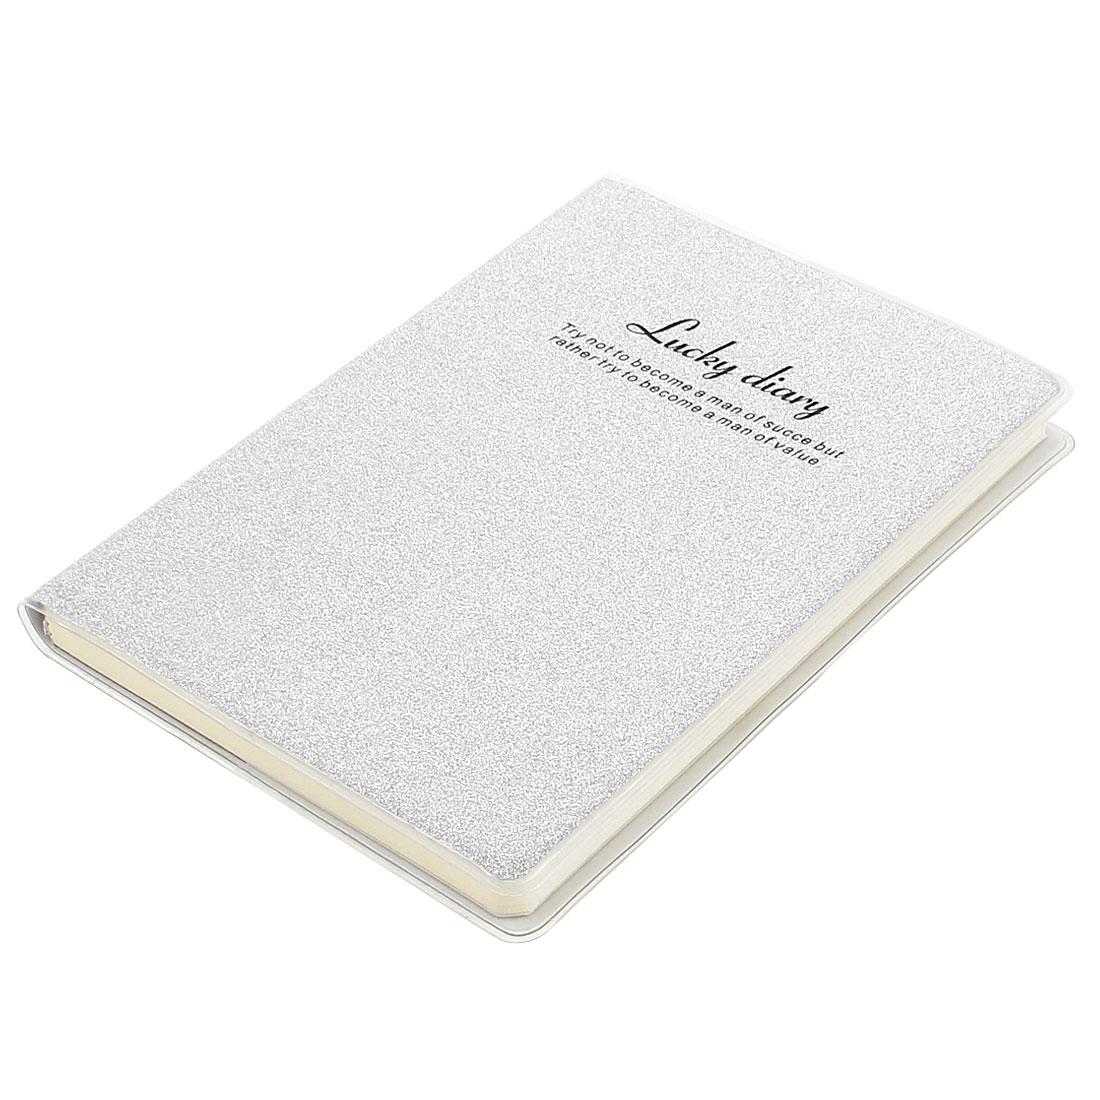 PVC Cover Silver Tone Glitter Powder Decor Diary Memo Book Notepad 80 Sheets